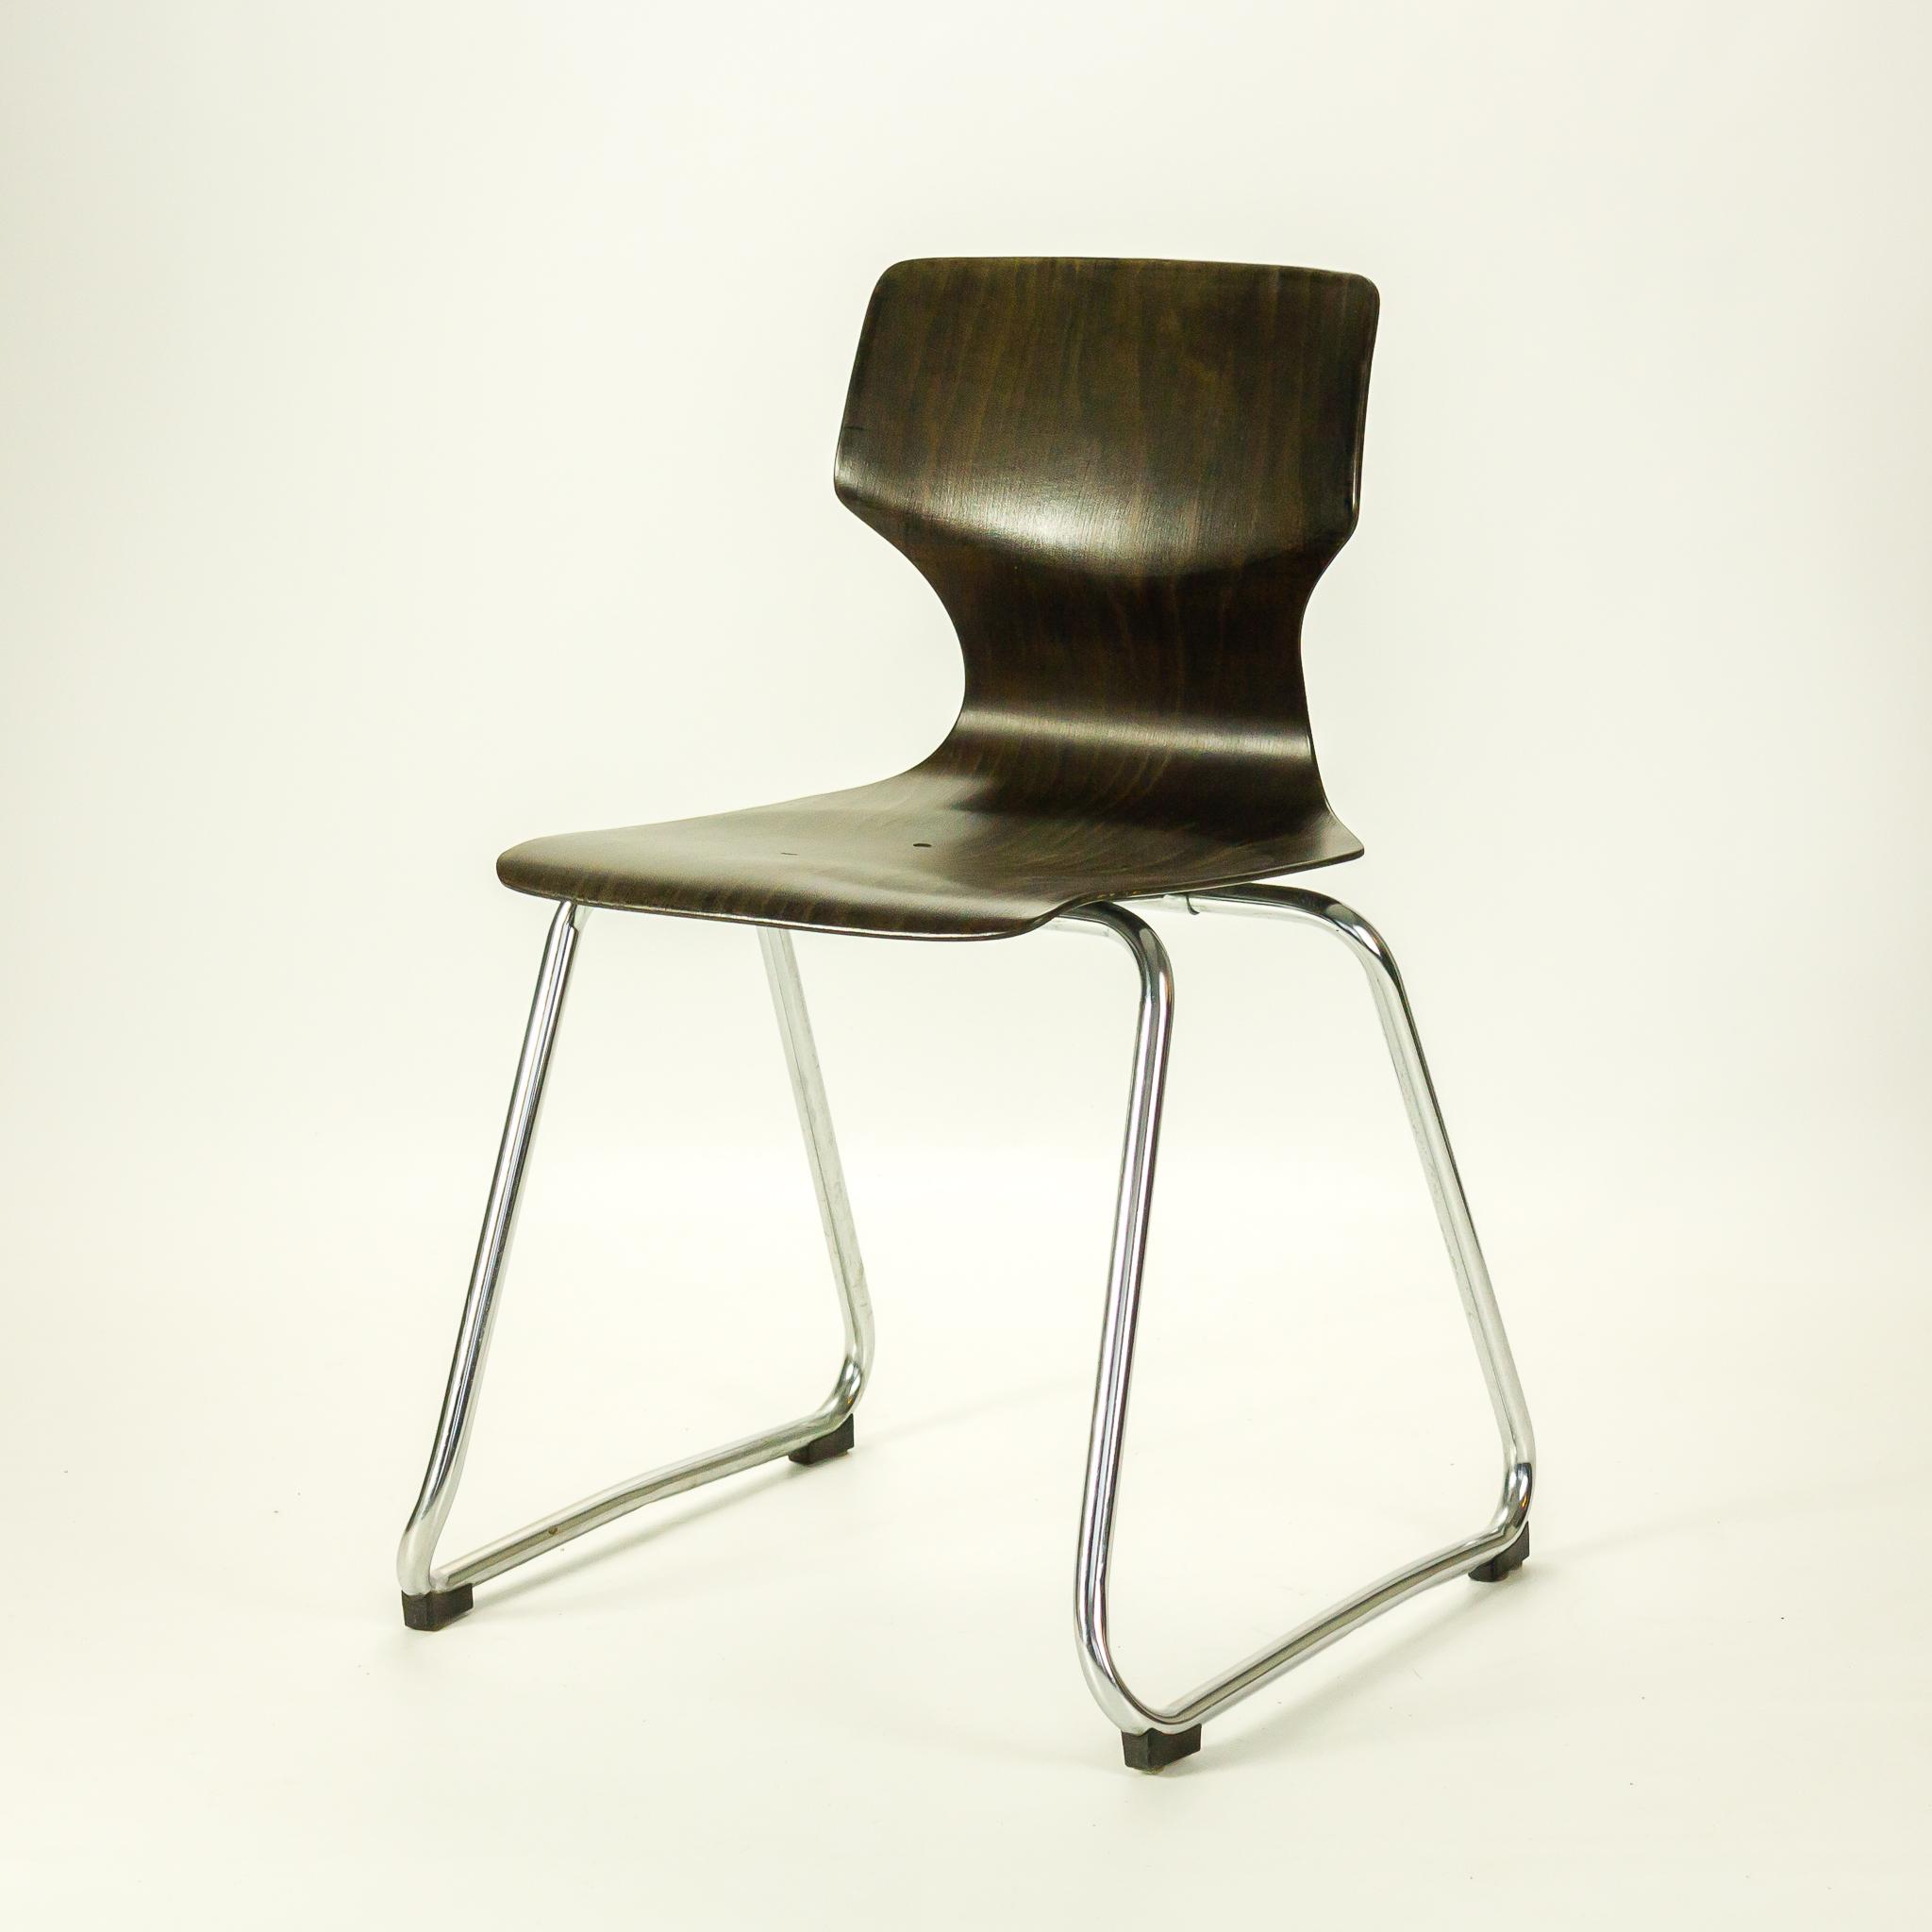 60's Flototto Pagholz stapel stoel set6